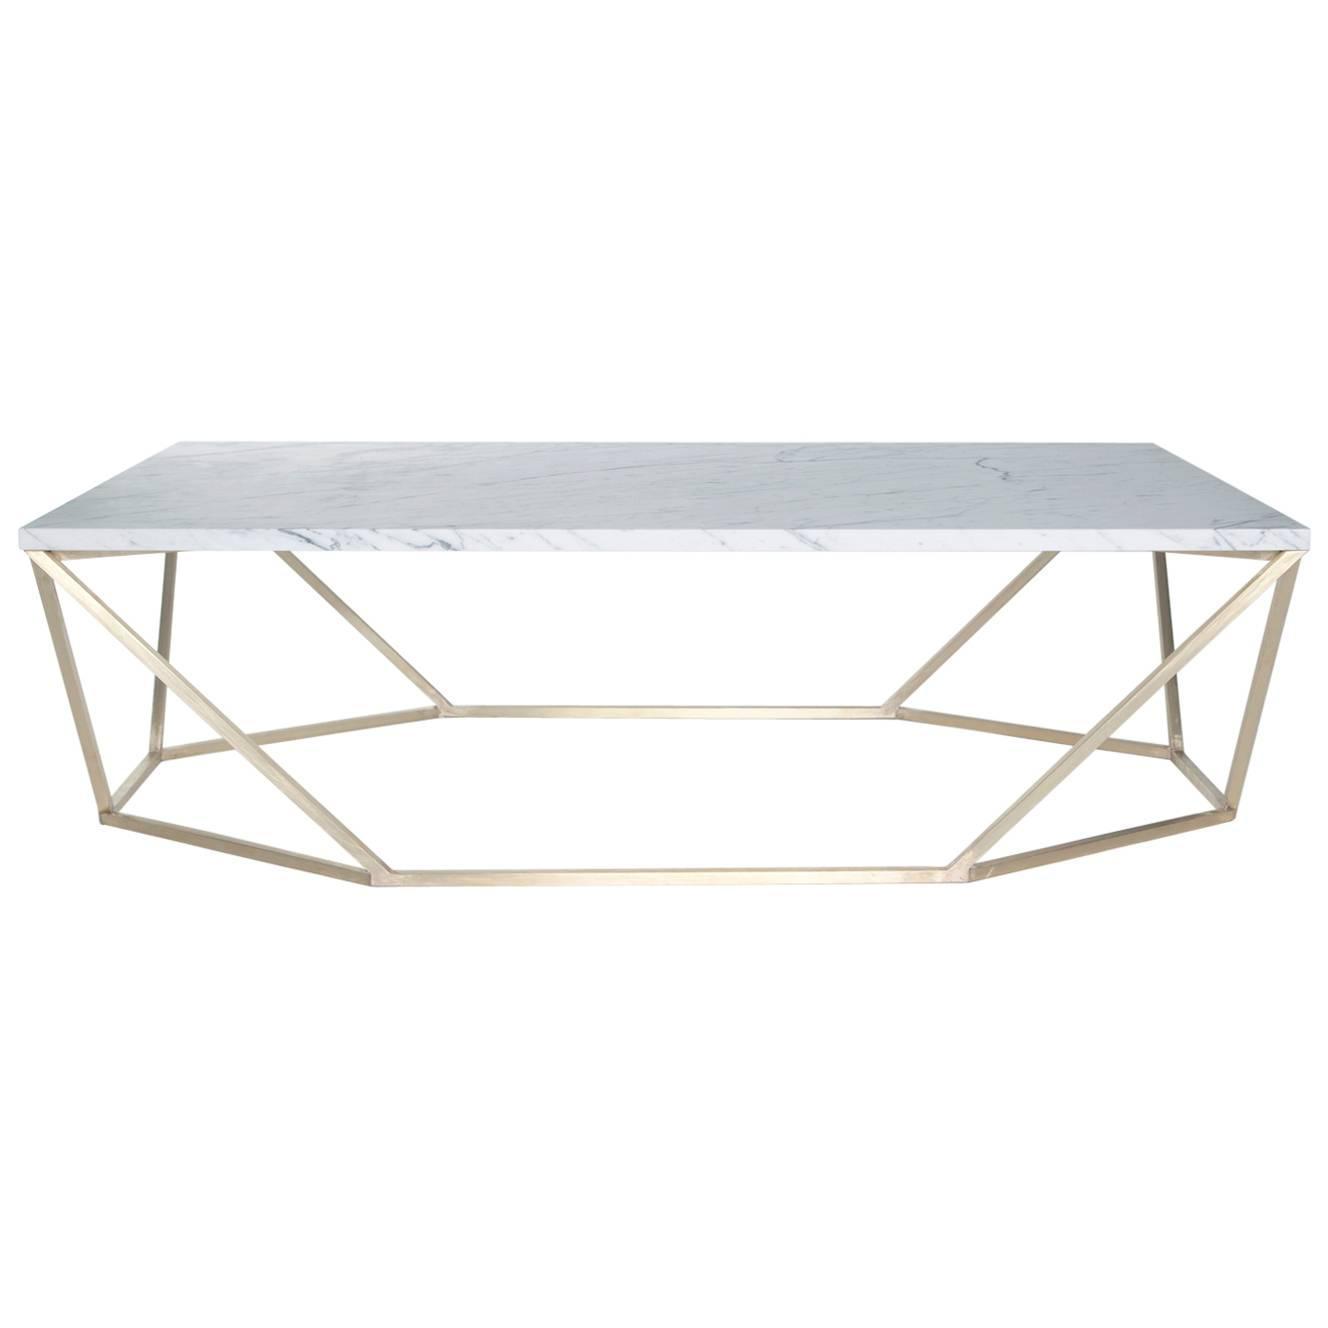 White Marble Fontana Coffee Table Brass: Dusk Coffee Table, Small In White Marble And Brushed Brass